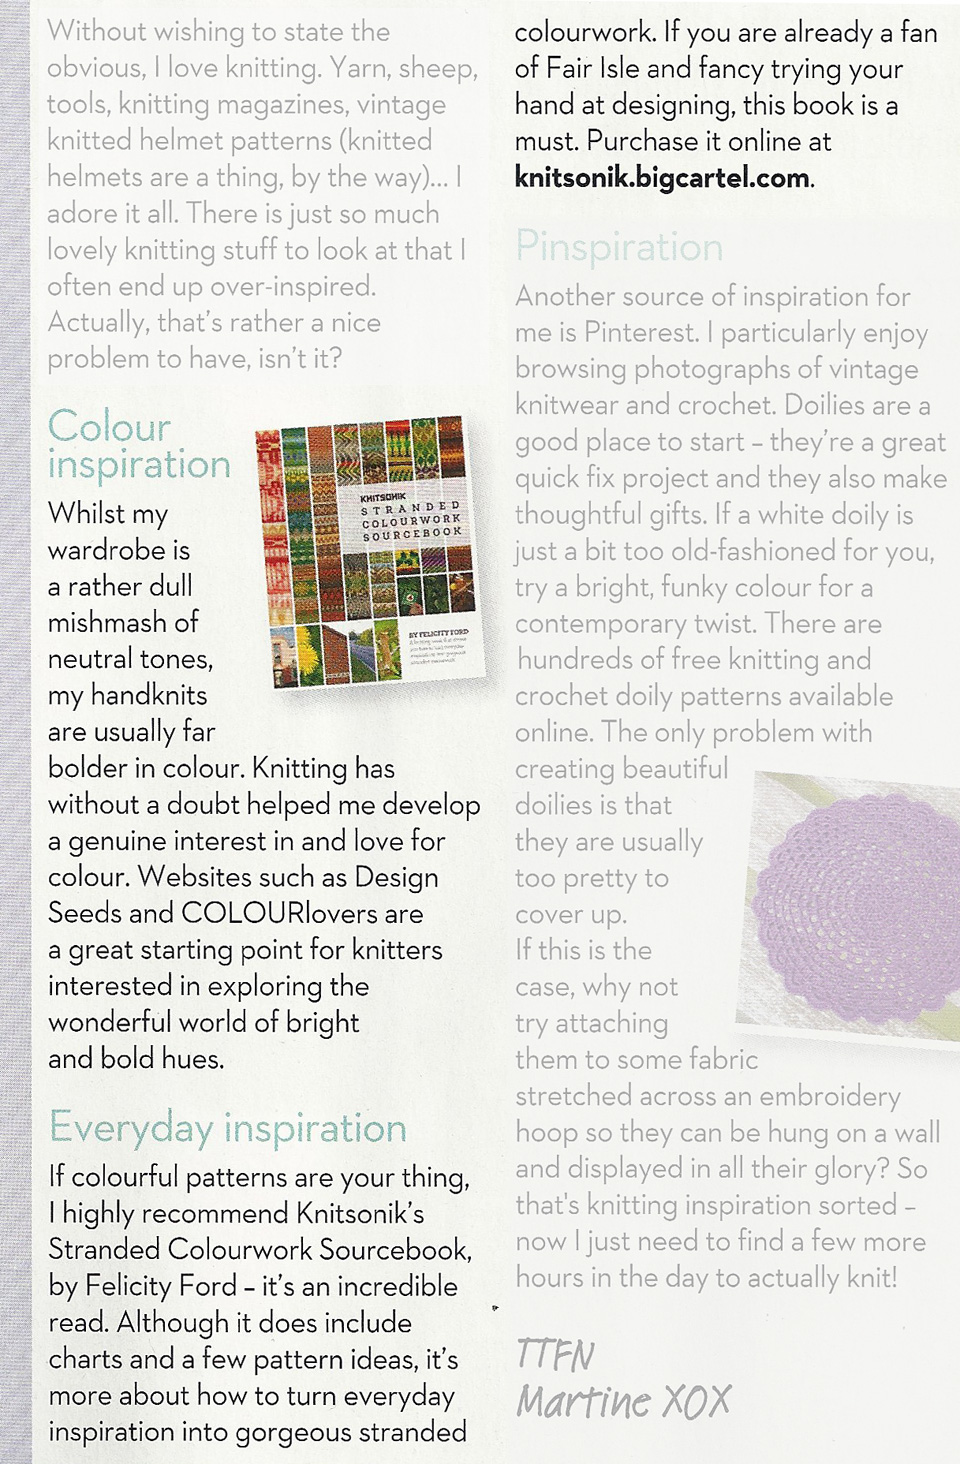 Let's Knit magazine, January 2015